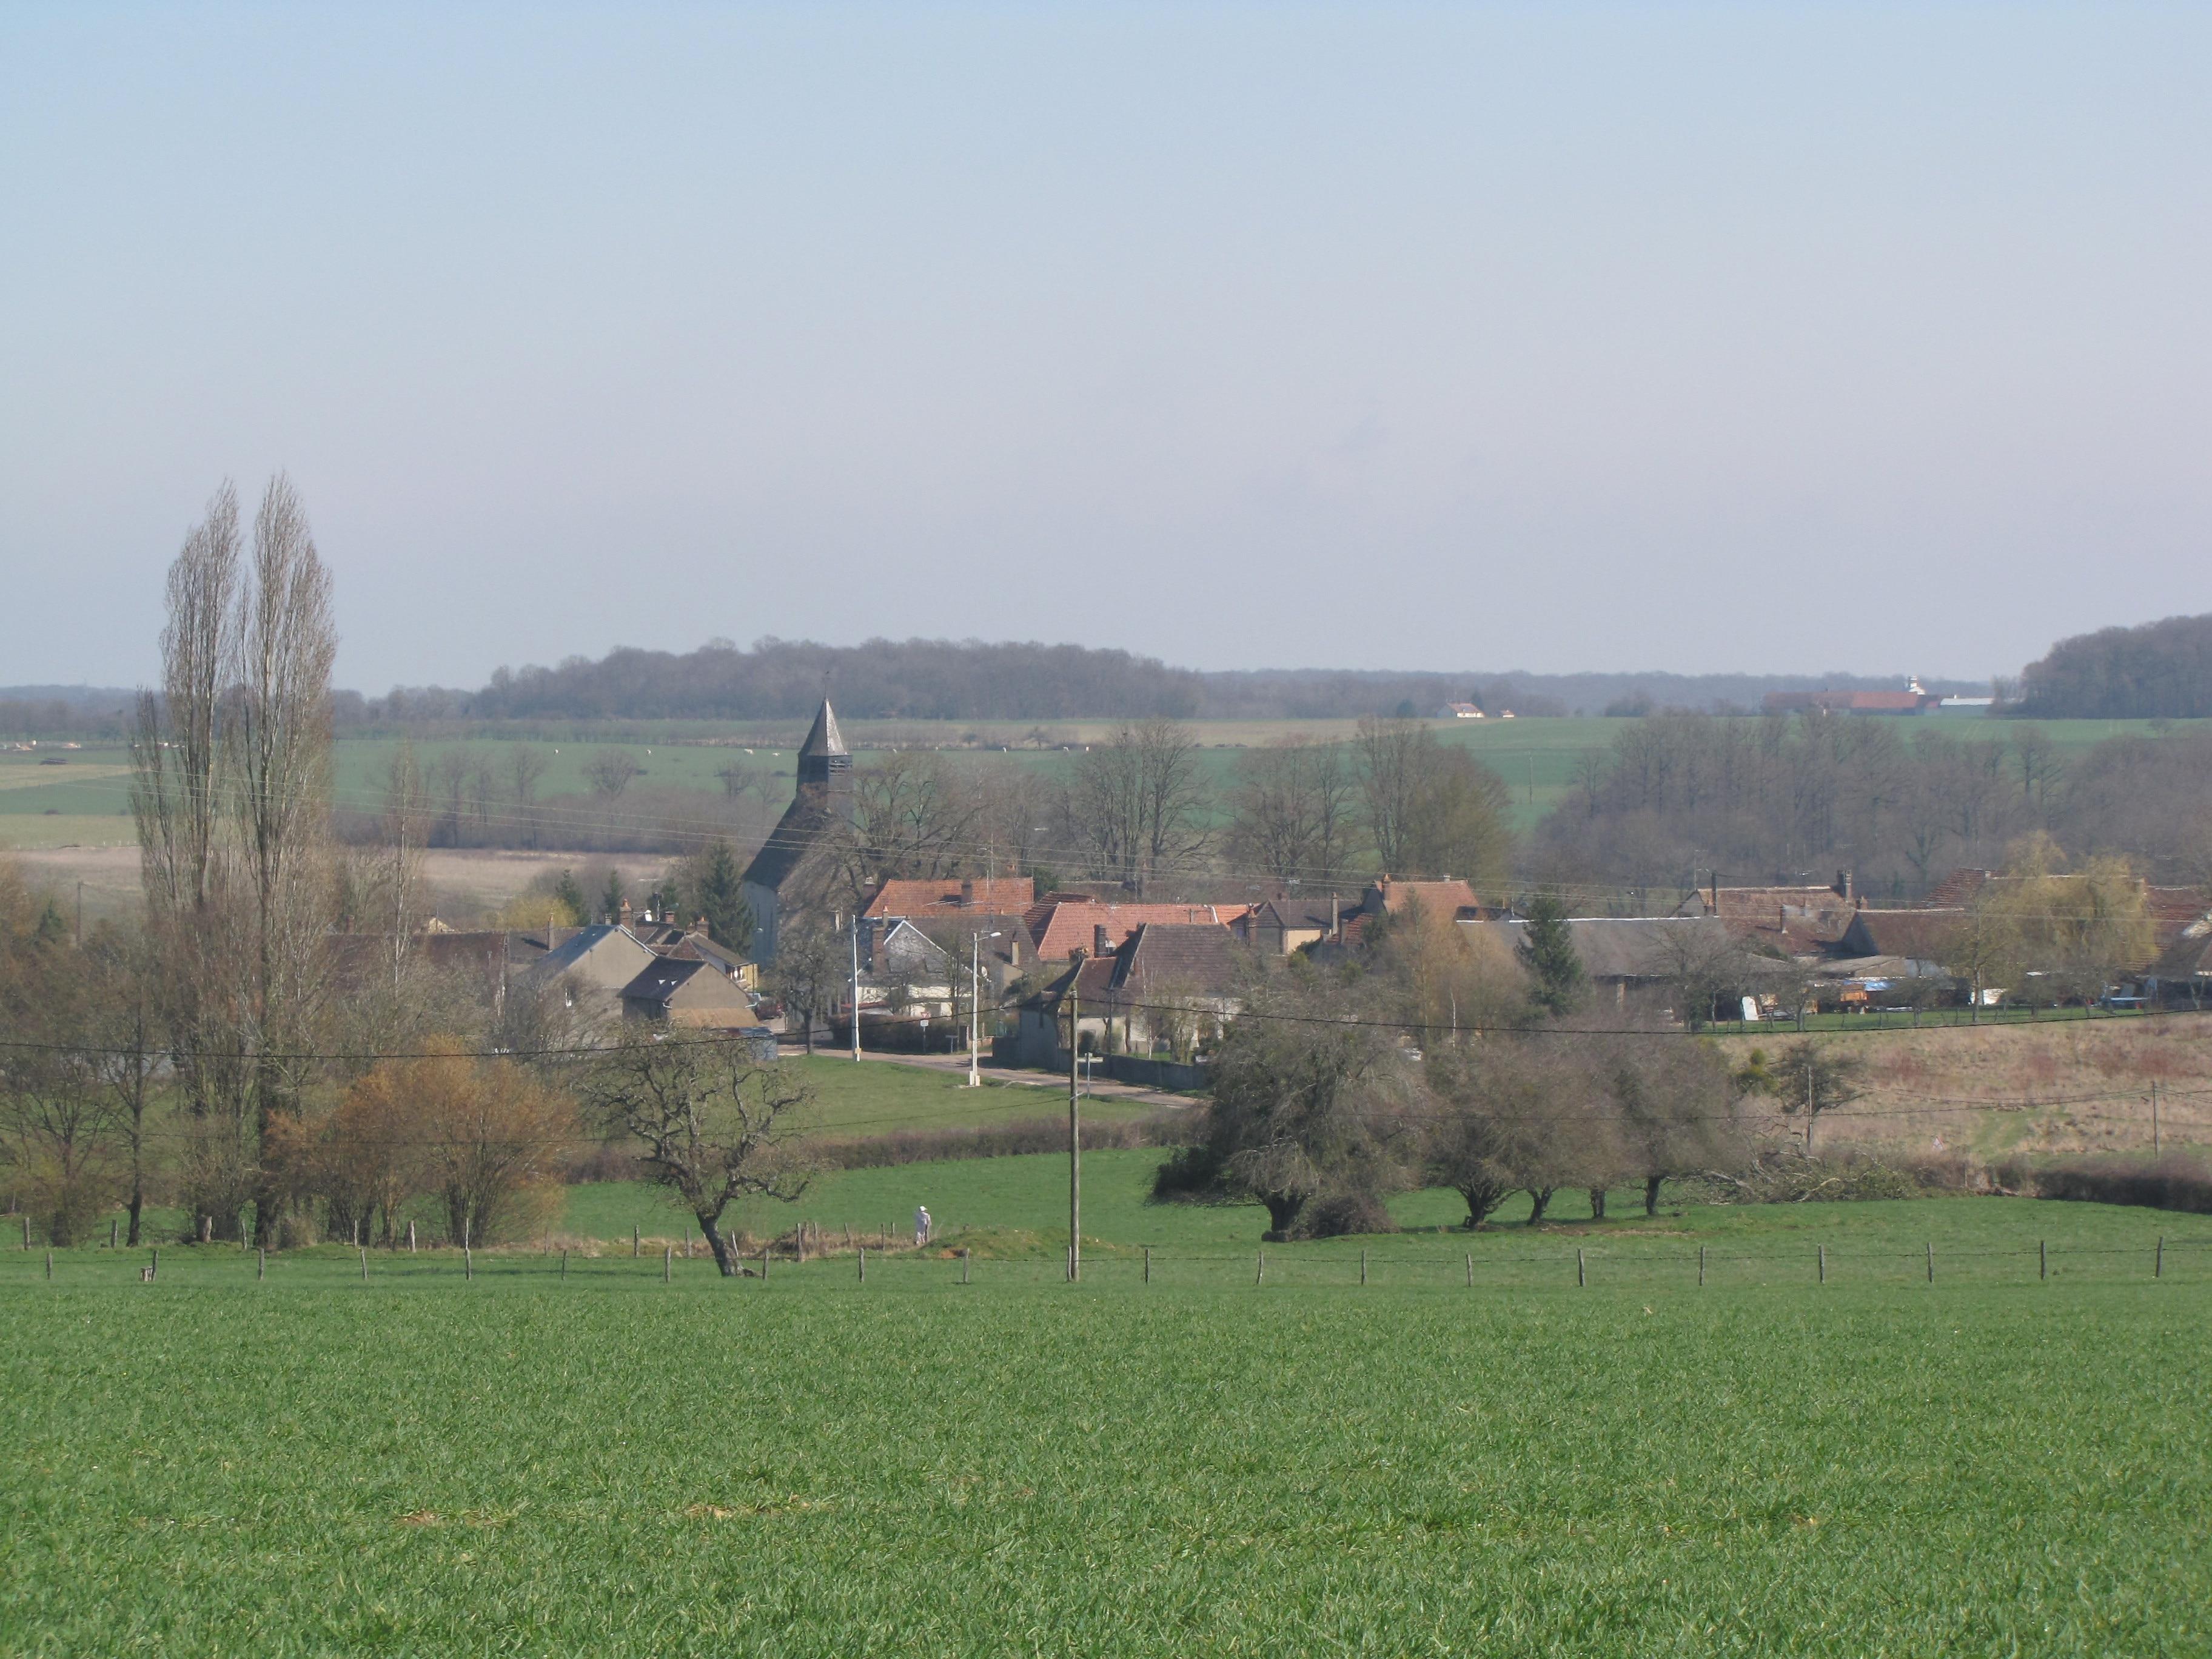 Charny-Oree-de-Puisaye, Yonne, France